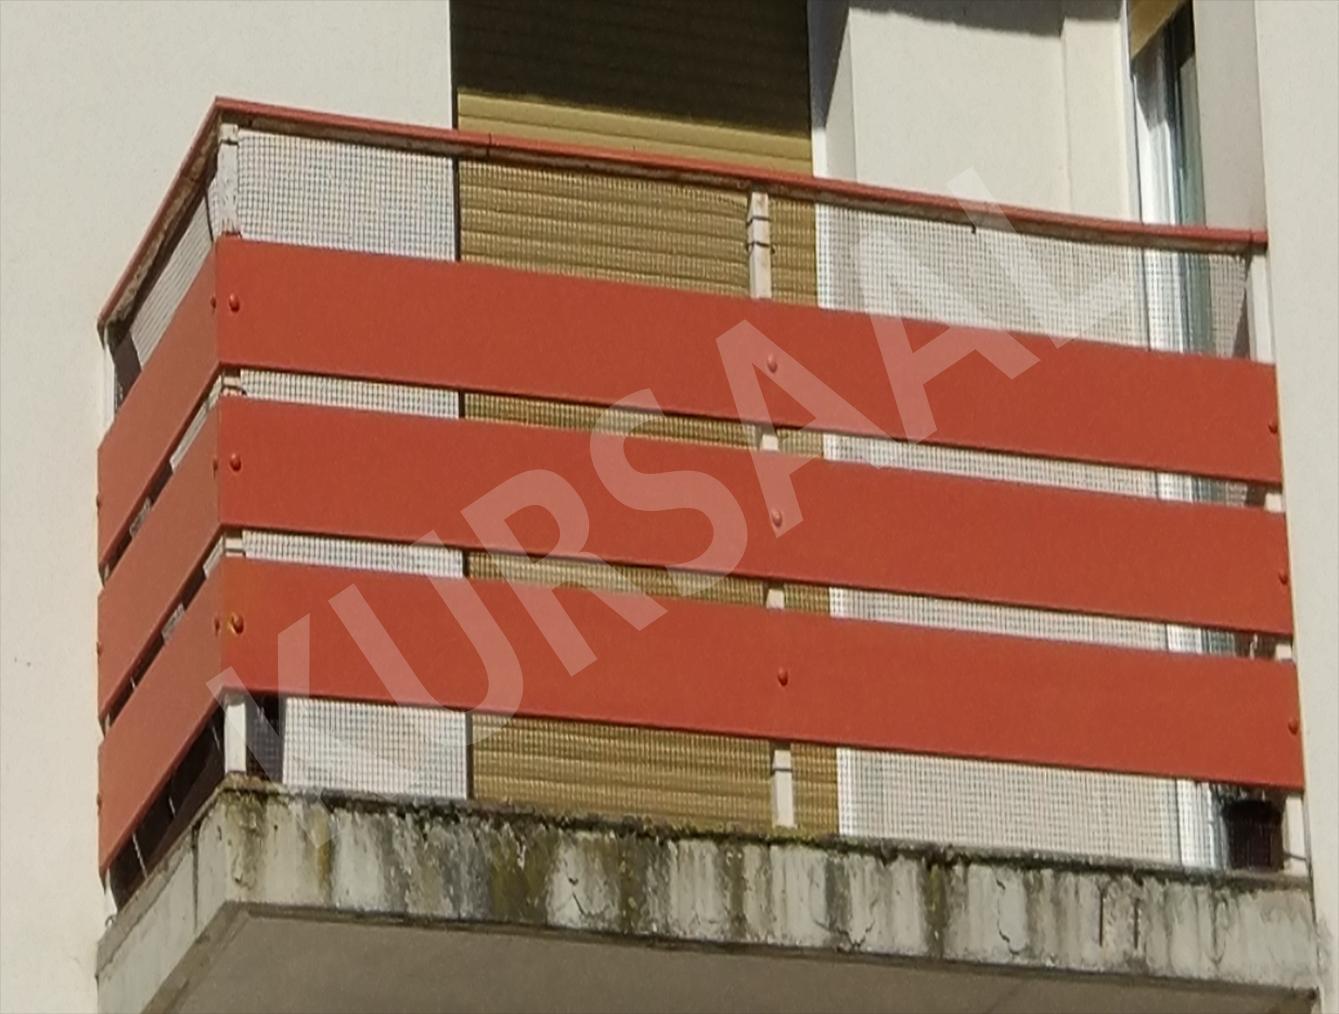 foto 15 - Aislamientos Térmicos y Eficiencia Energética-Amalkor 1-ADUNA- GIPUZKOA